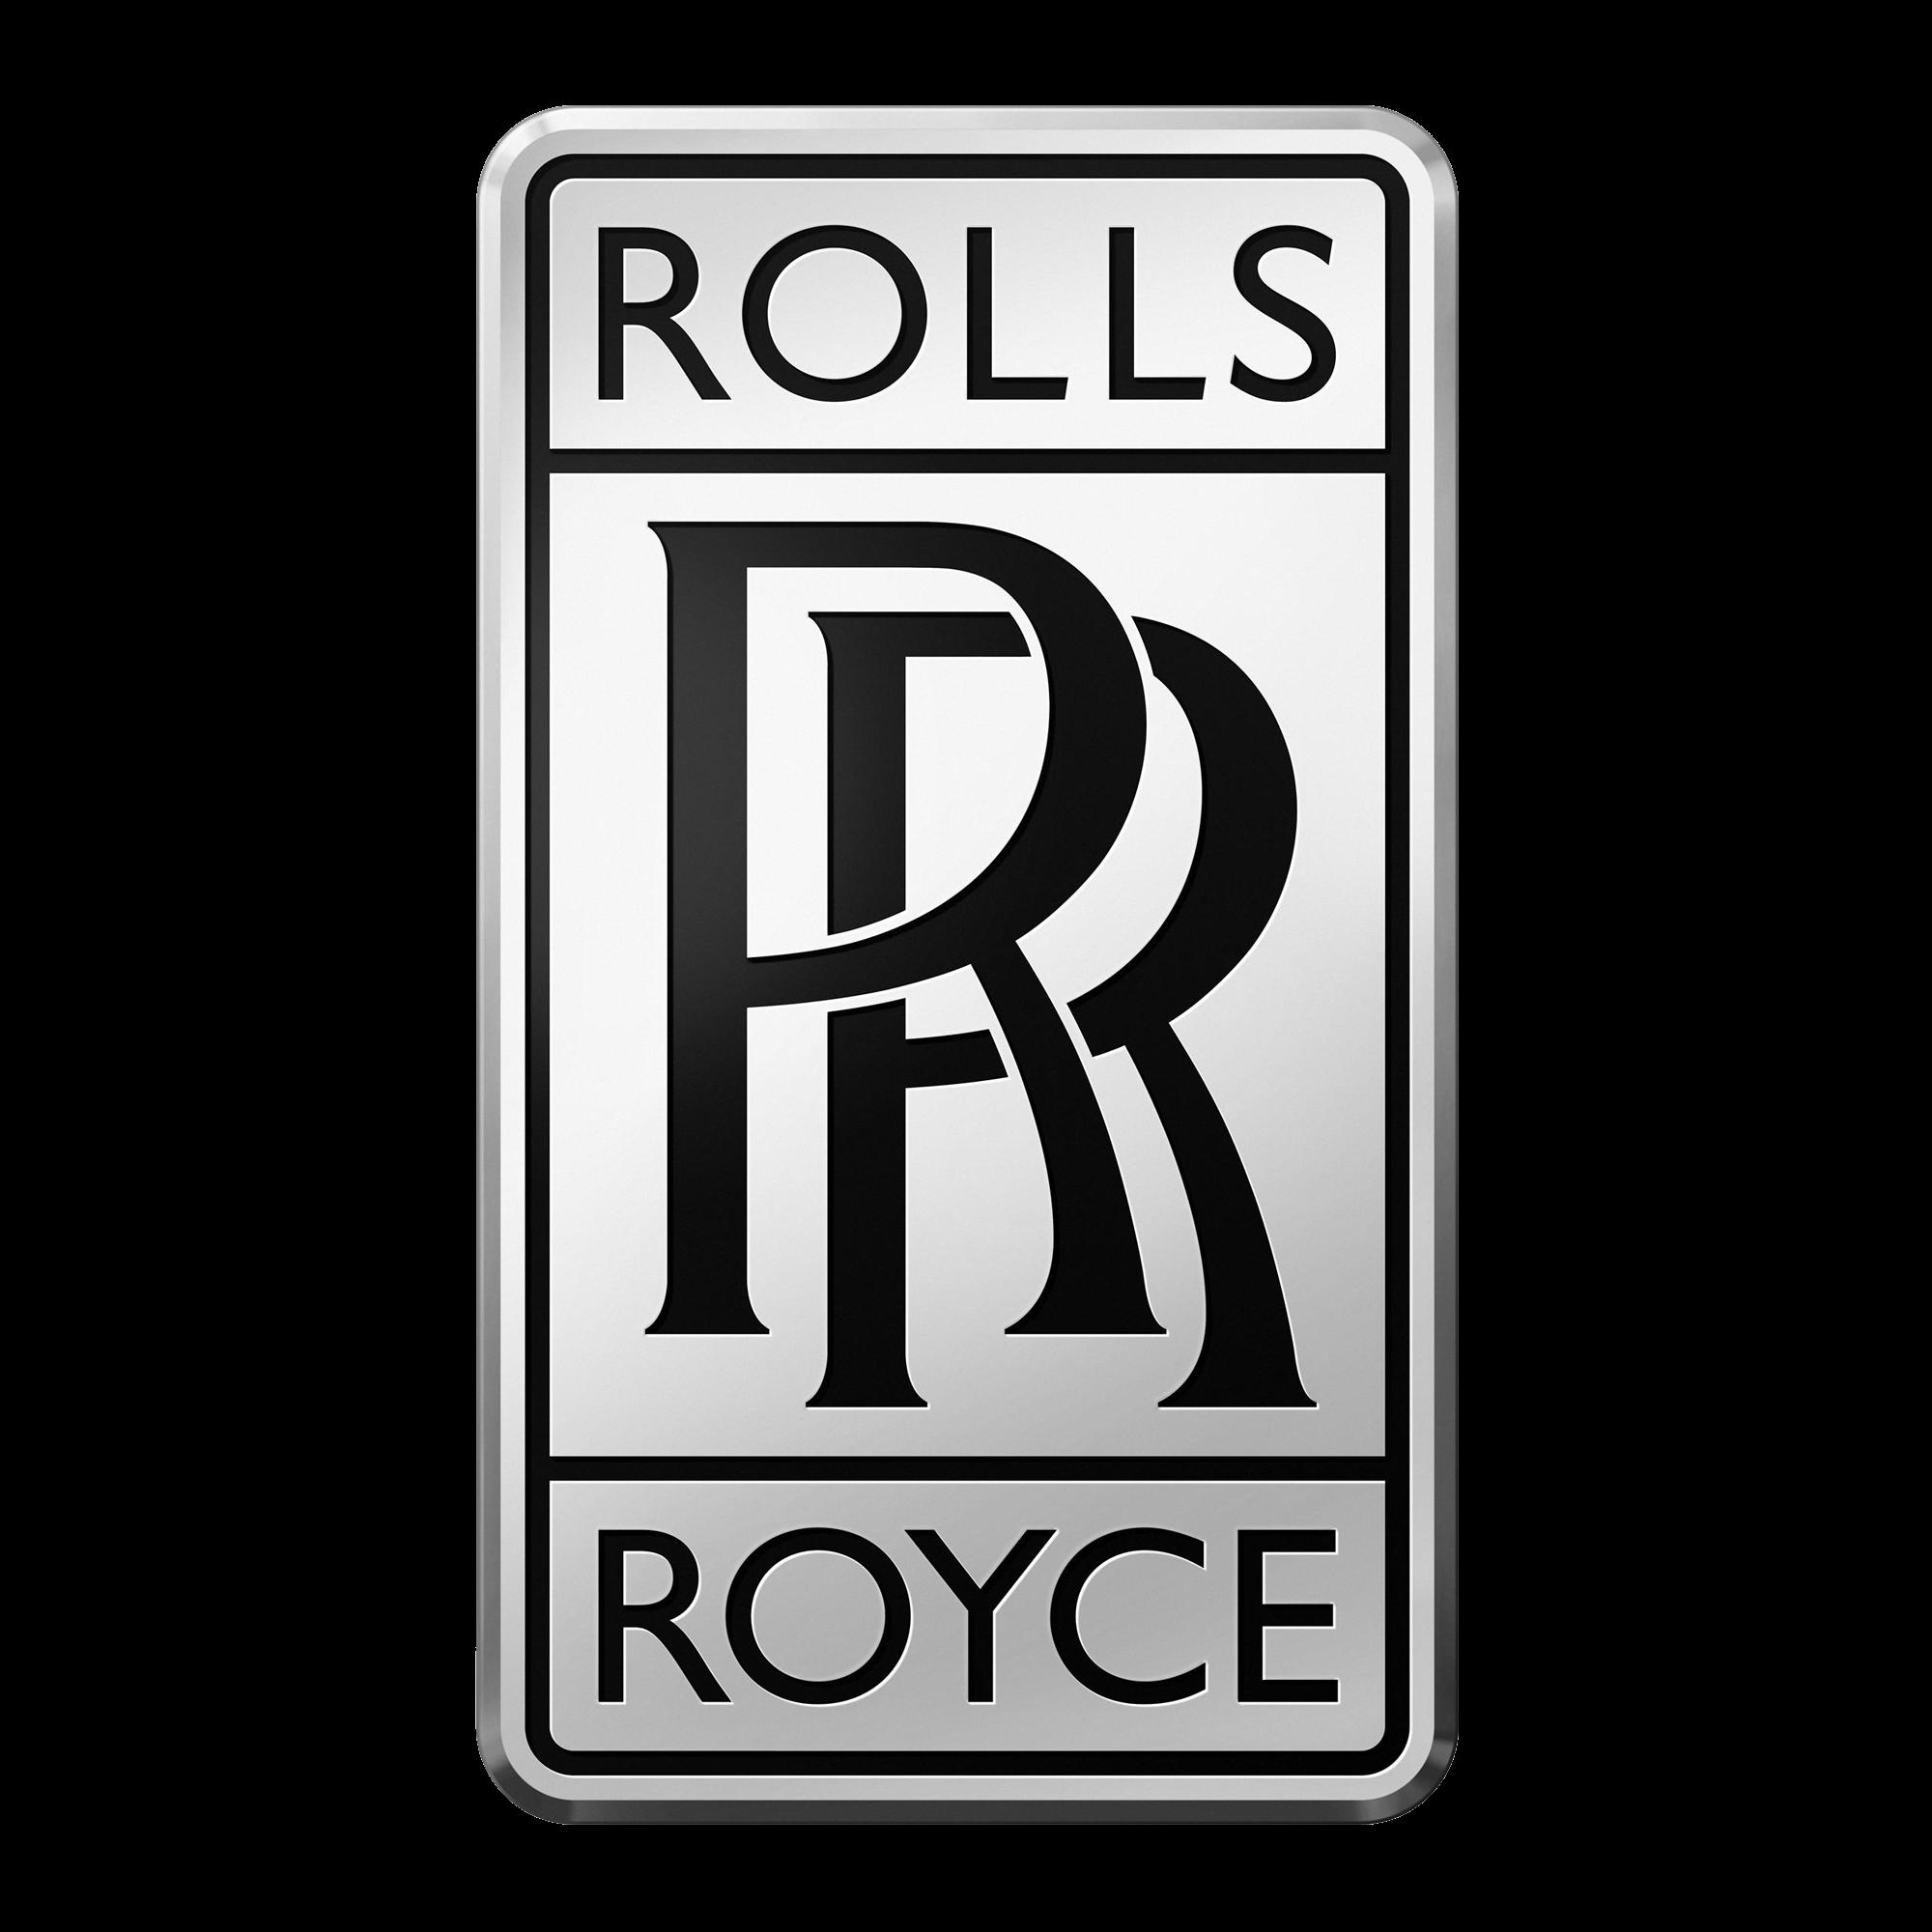 Jeep Wrangler Rental Chicago: Rolls-Royce Logo, Rolls-Royce Car Symbol Meaning And